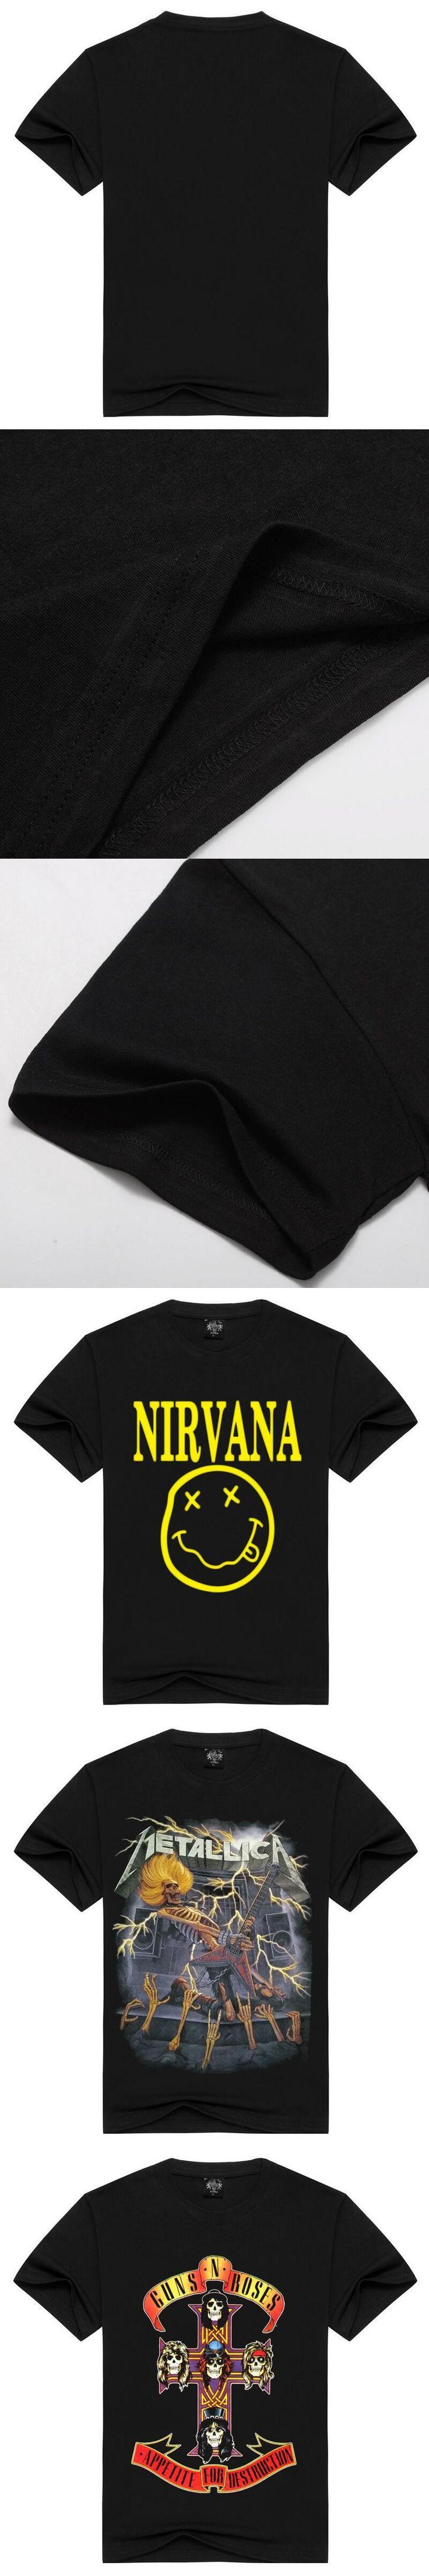 Tee Men Black T-Shirt 100% Cotton Metallica Skull Print Heavy Metal Rock Hip Hop Clothing Black short T shirts S M L XXL XXXL